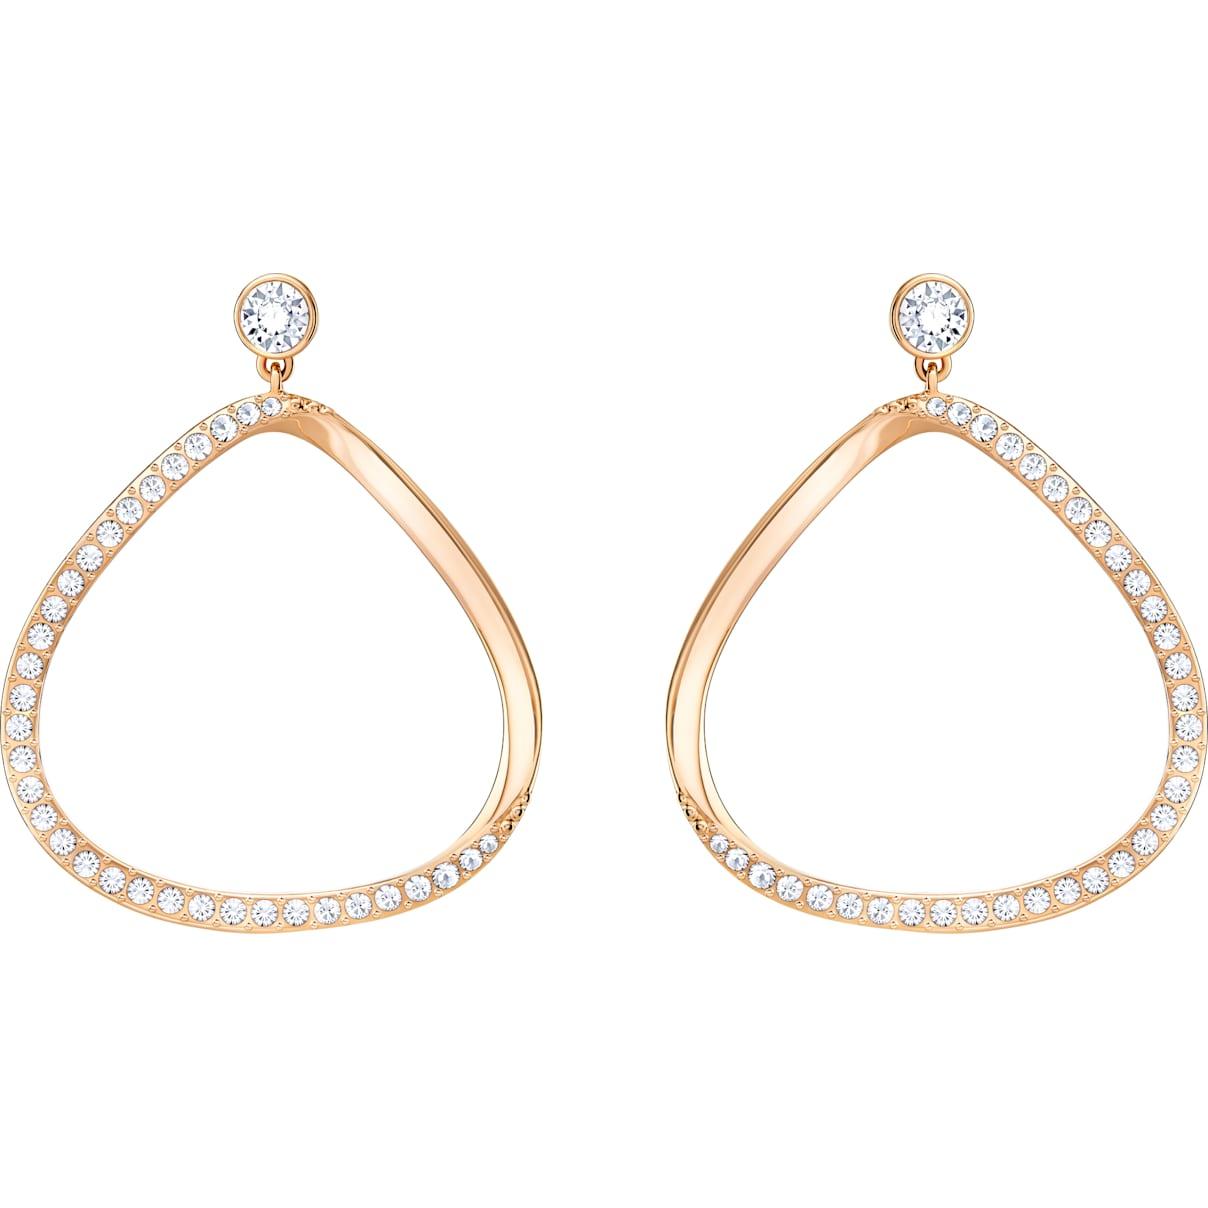 Swarovski Gaya Pierced Earrings, White, Rose-gold tone plated